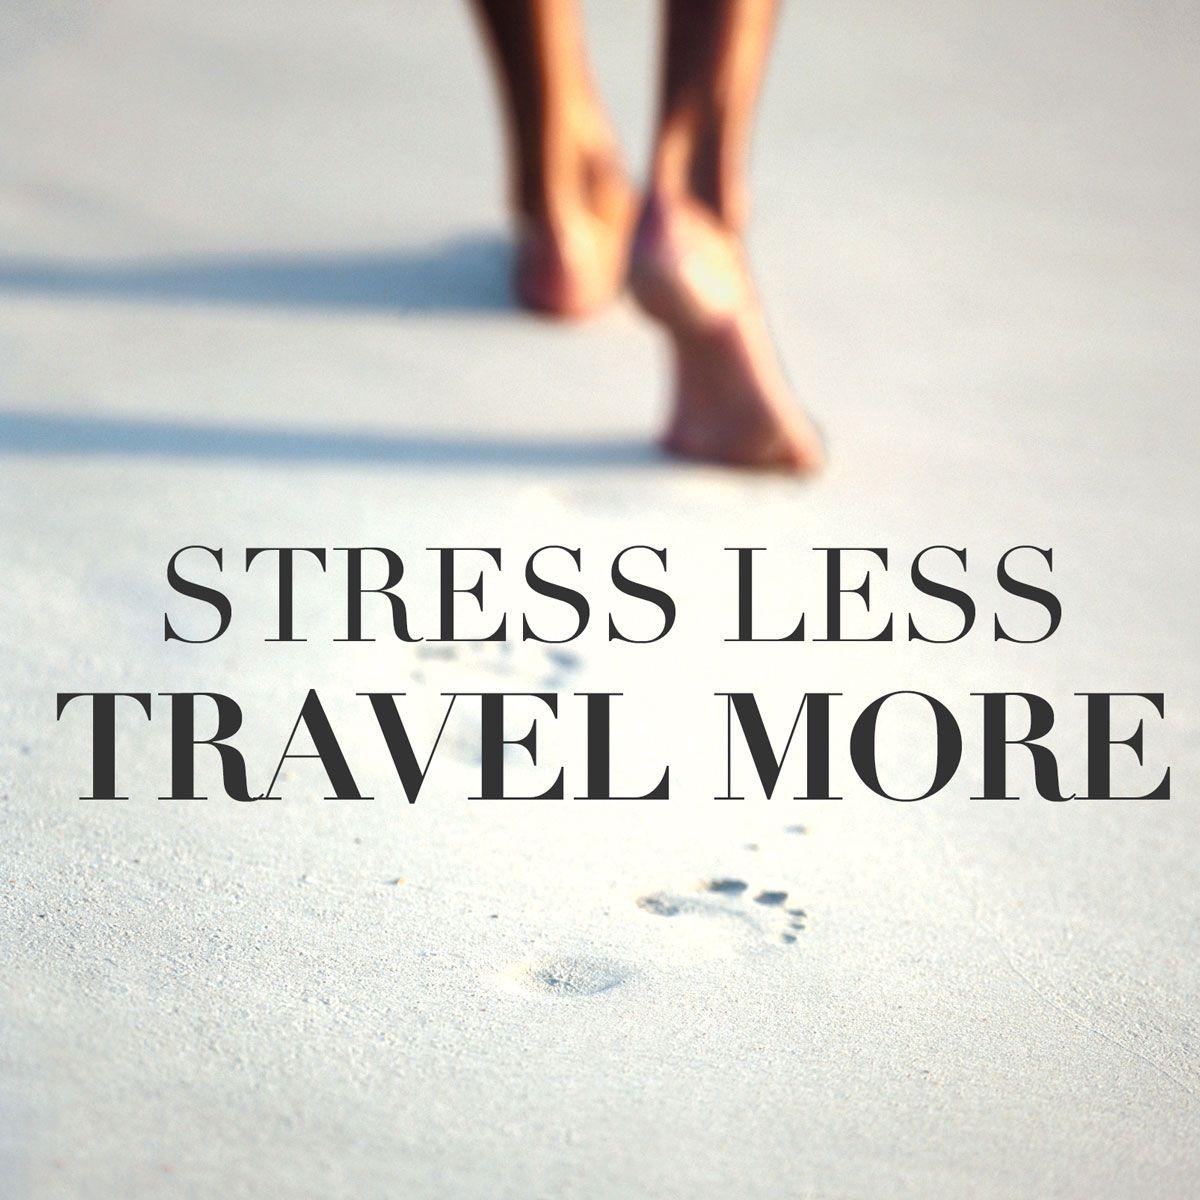 Stress Less Travel More